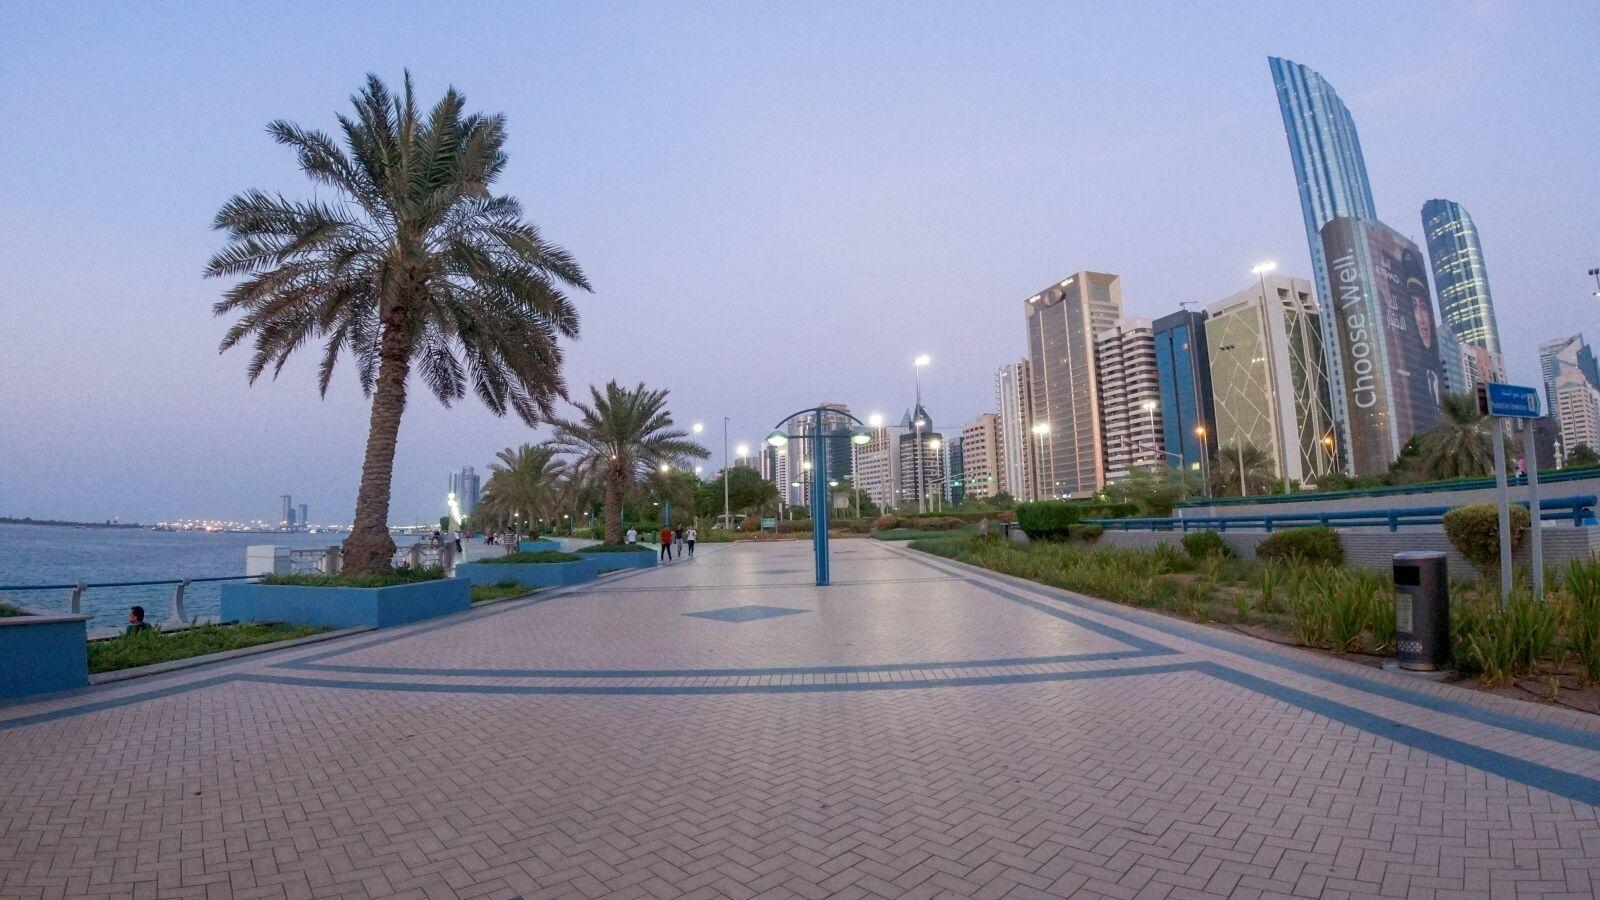 "DJI OSMO ACTION sample photo. ""Beach, city, building"" photography"